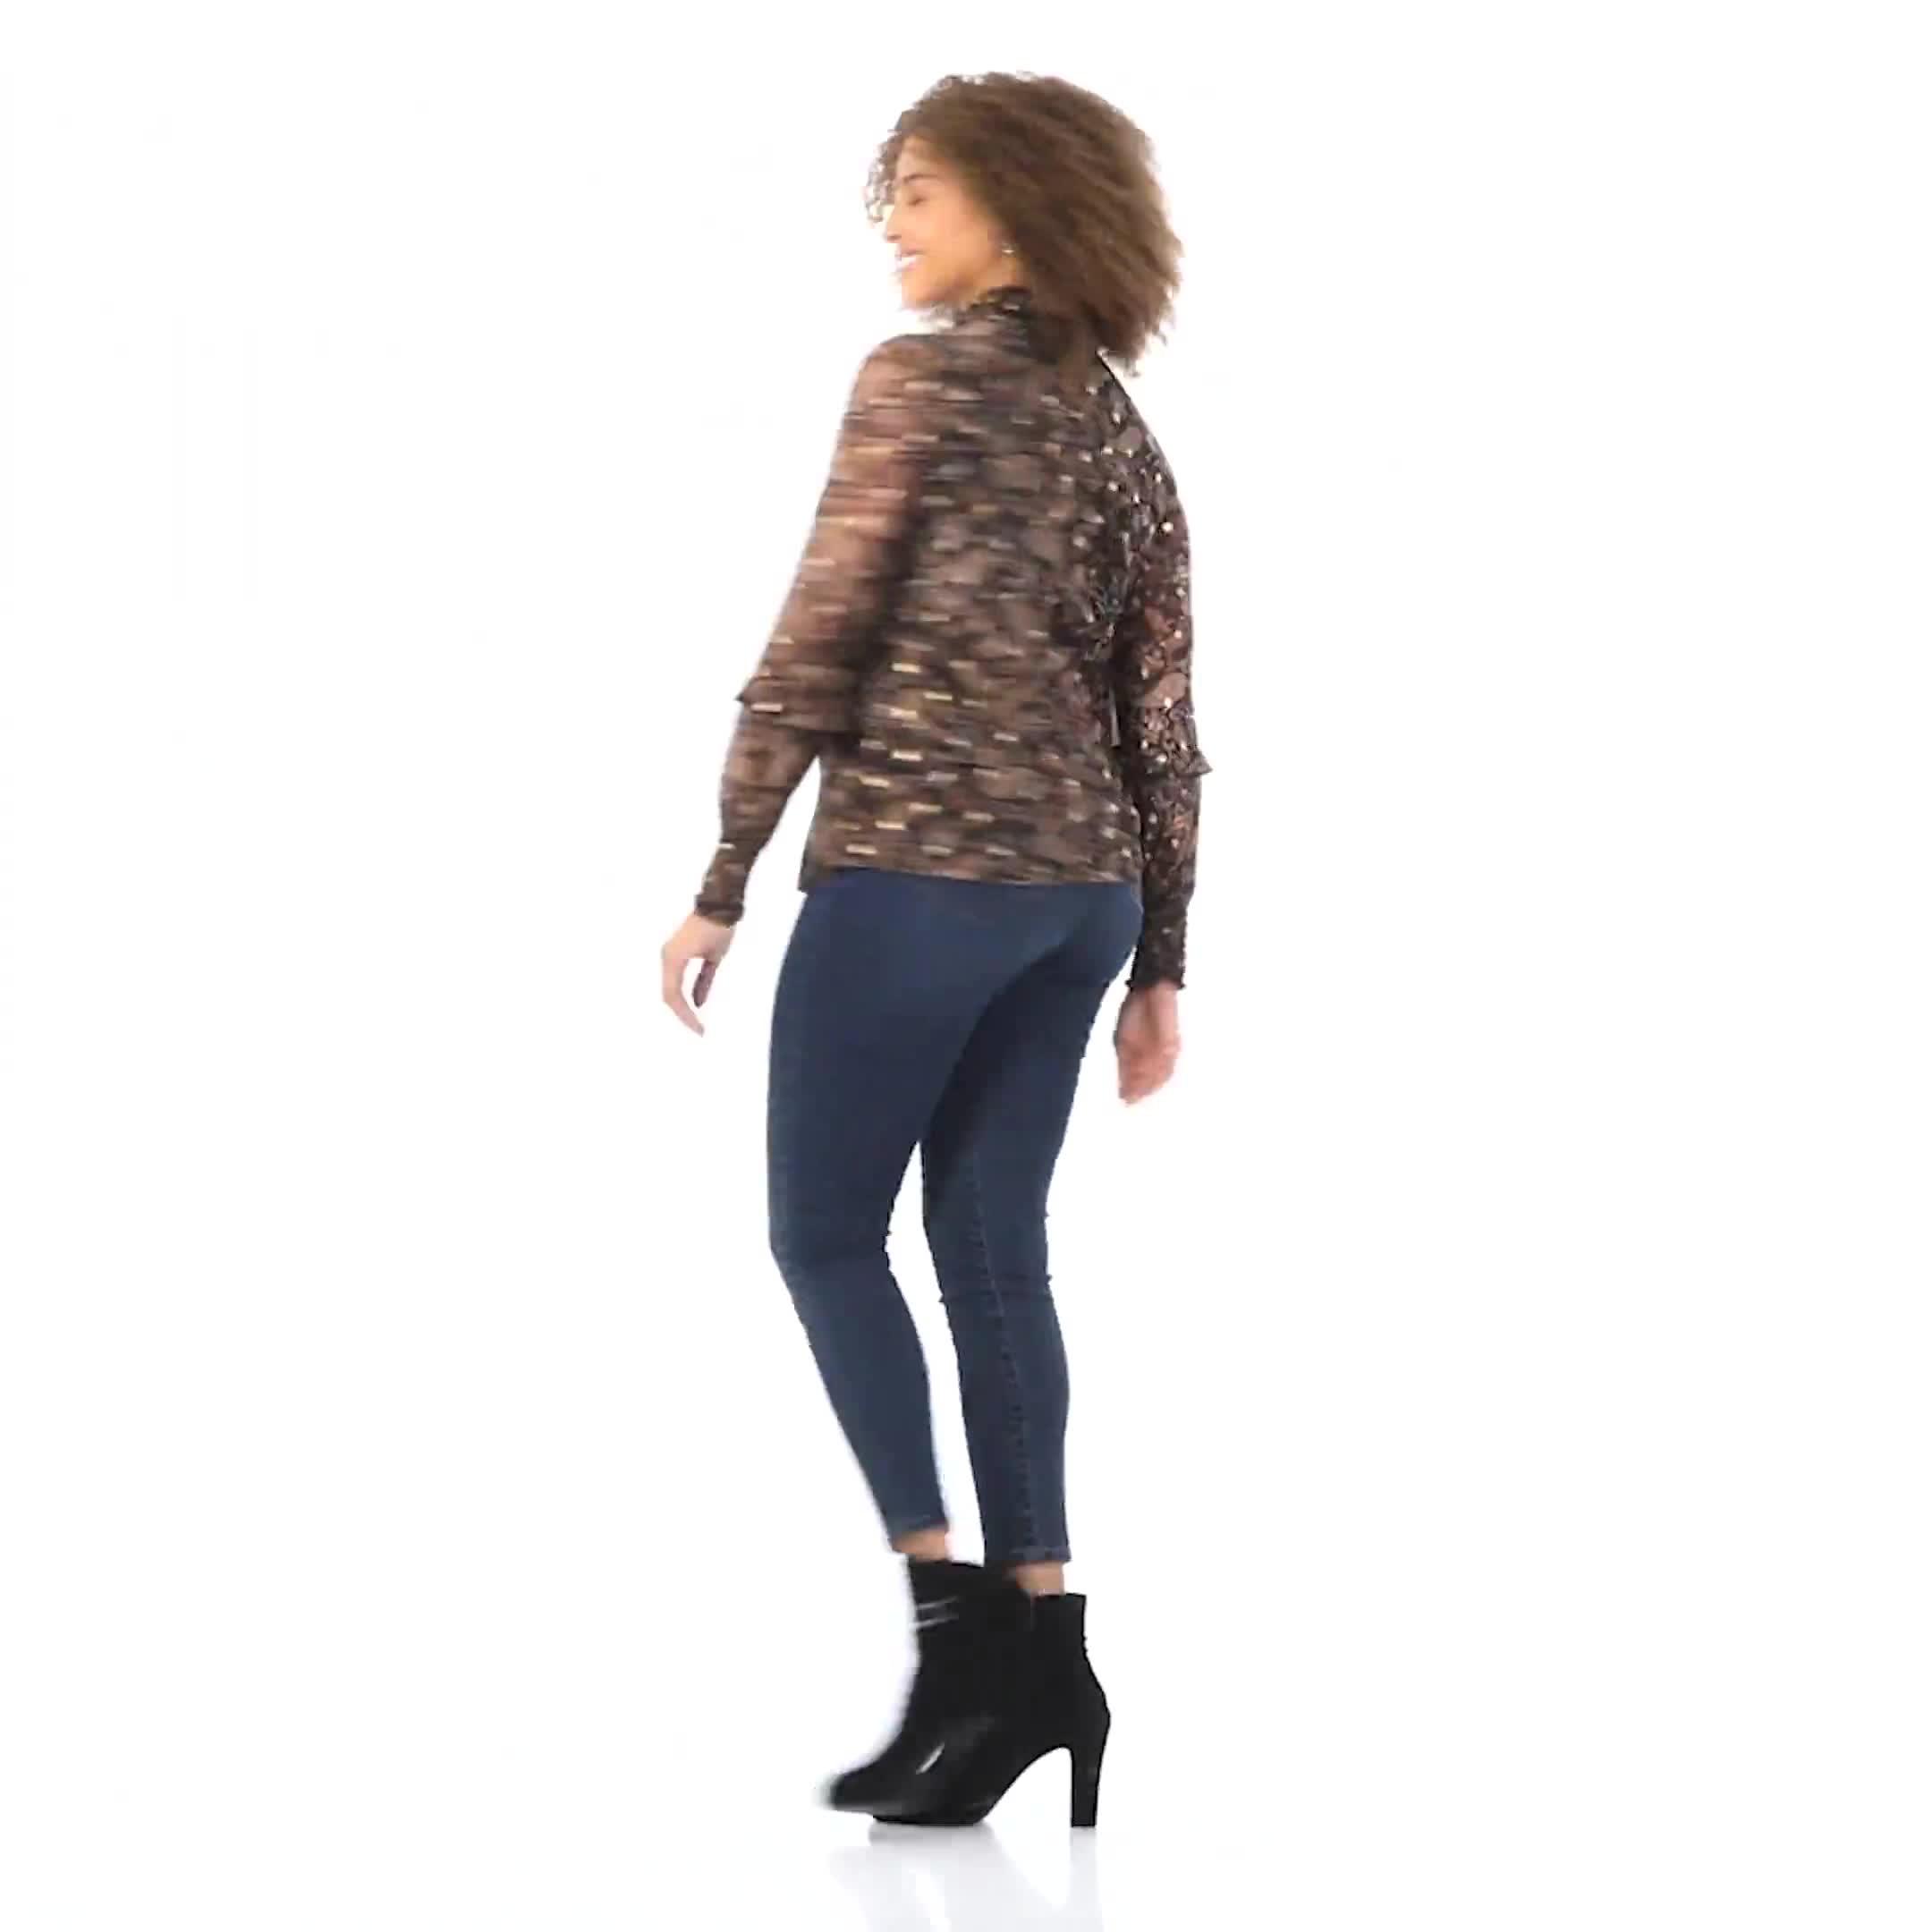 Roz & Ali Foil Paisley Smocked Neck Blouse - Video